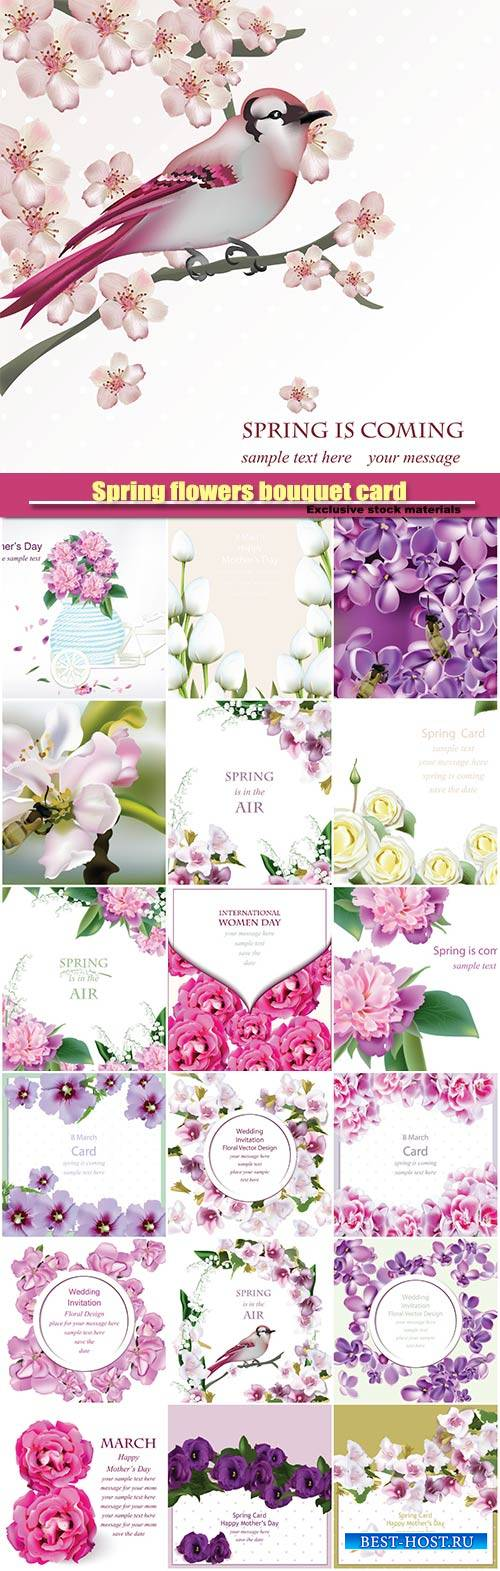 Spring flowers bouquet card background, weddings, birthday, anniversaryv ec ...